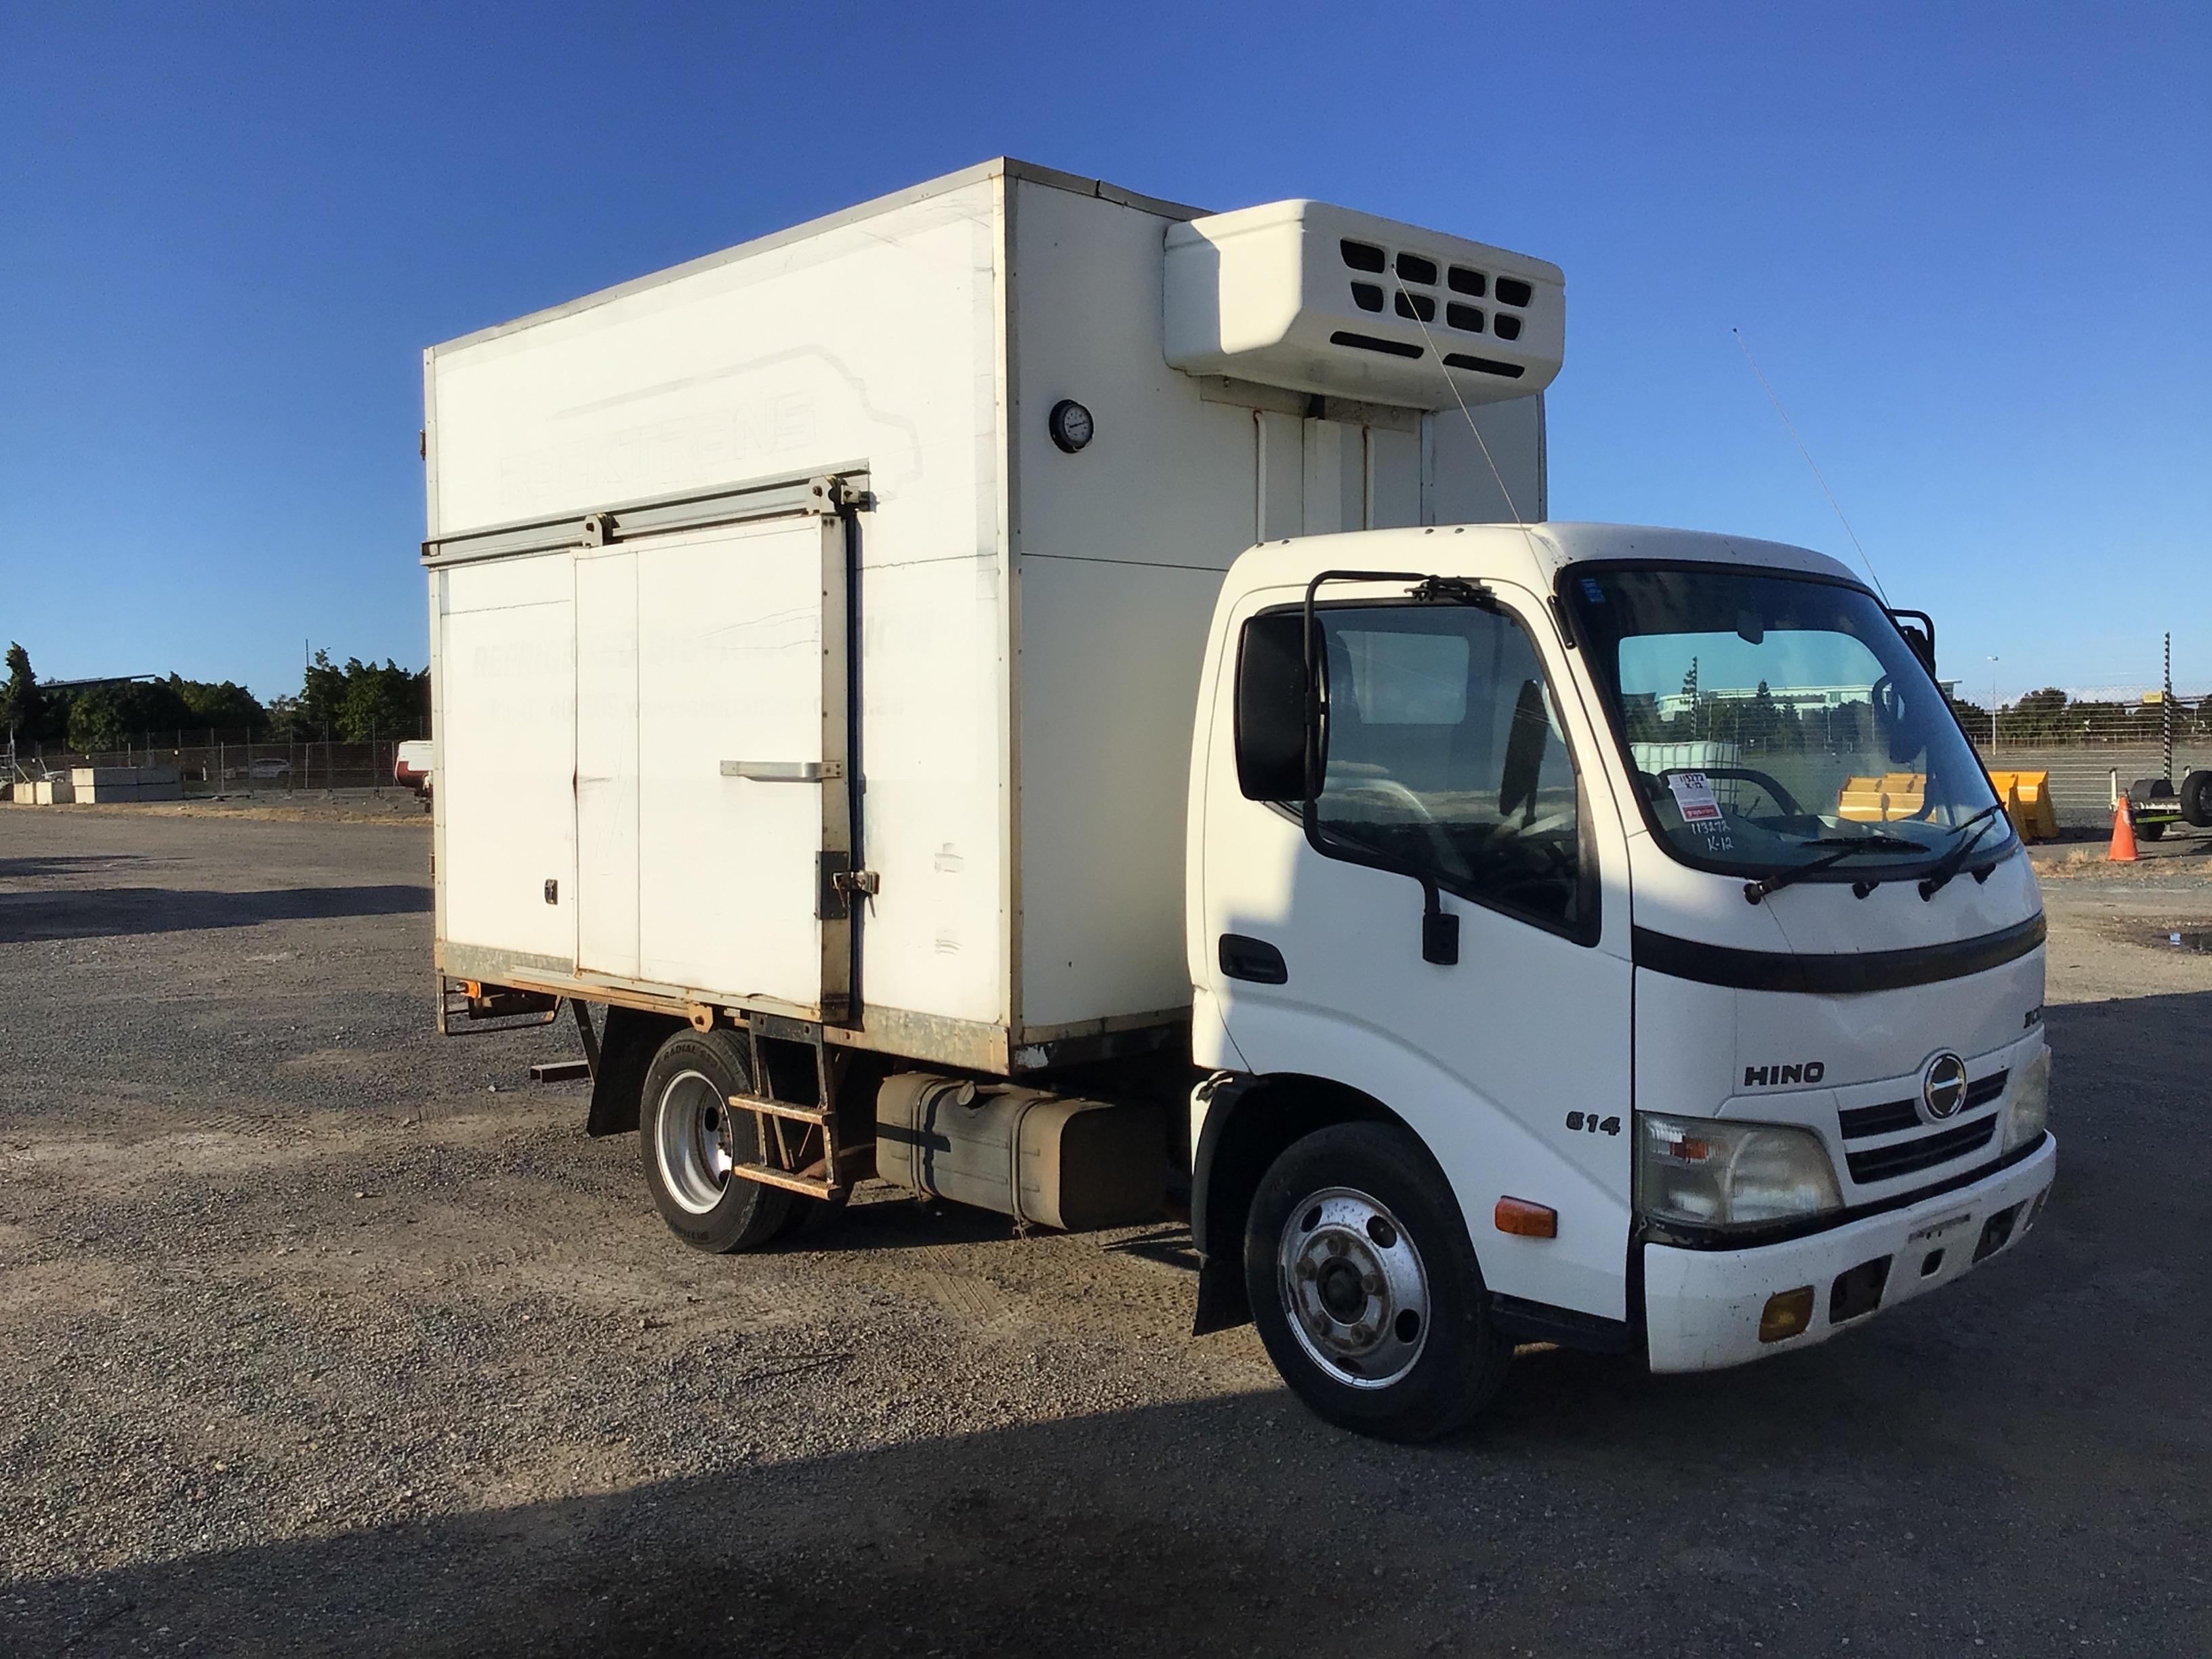 2007 Hino 300 4 x 2 Refrigerated Body Truck